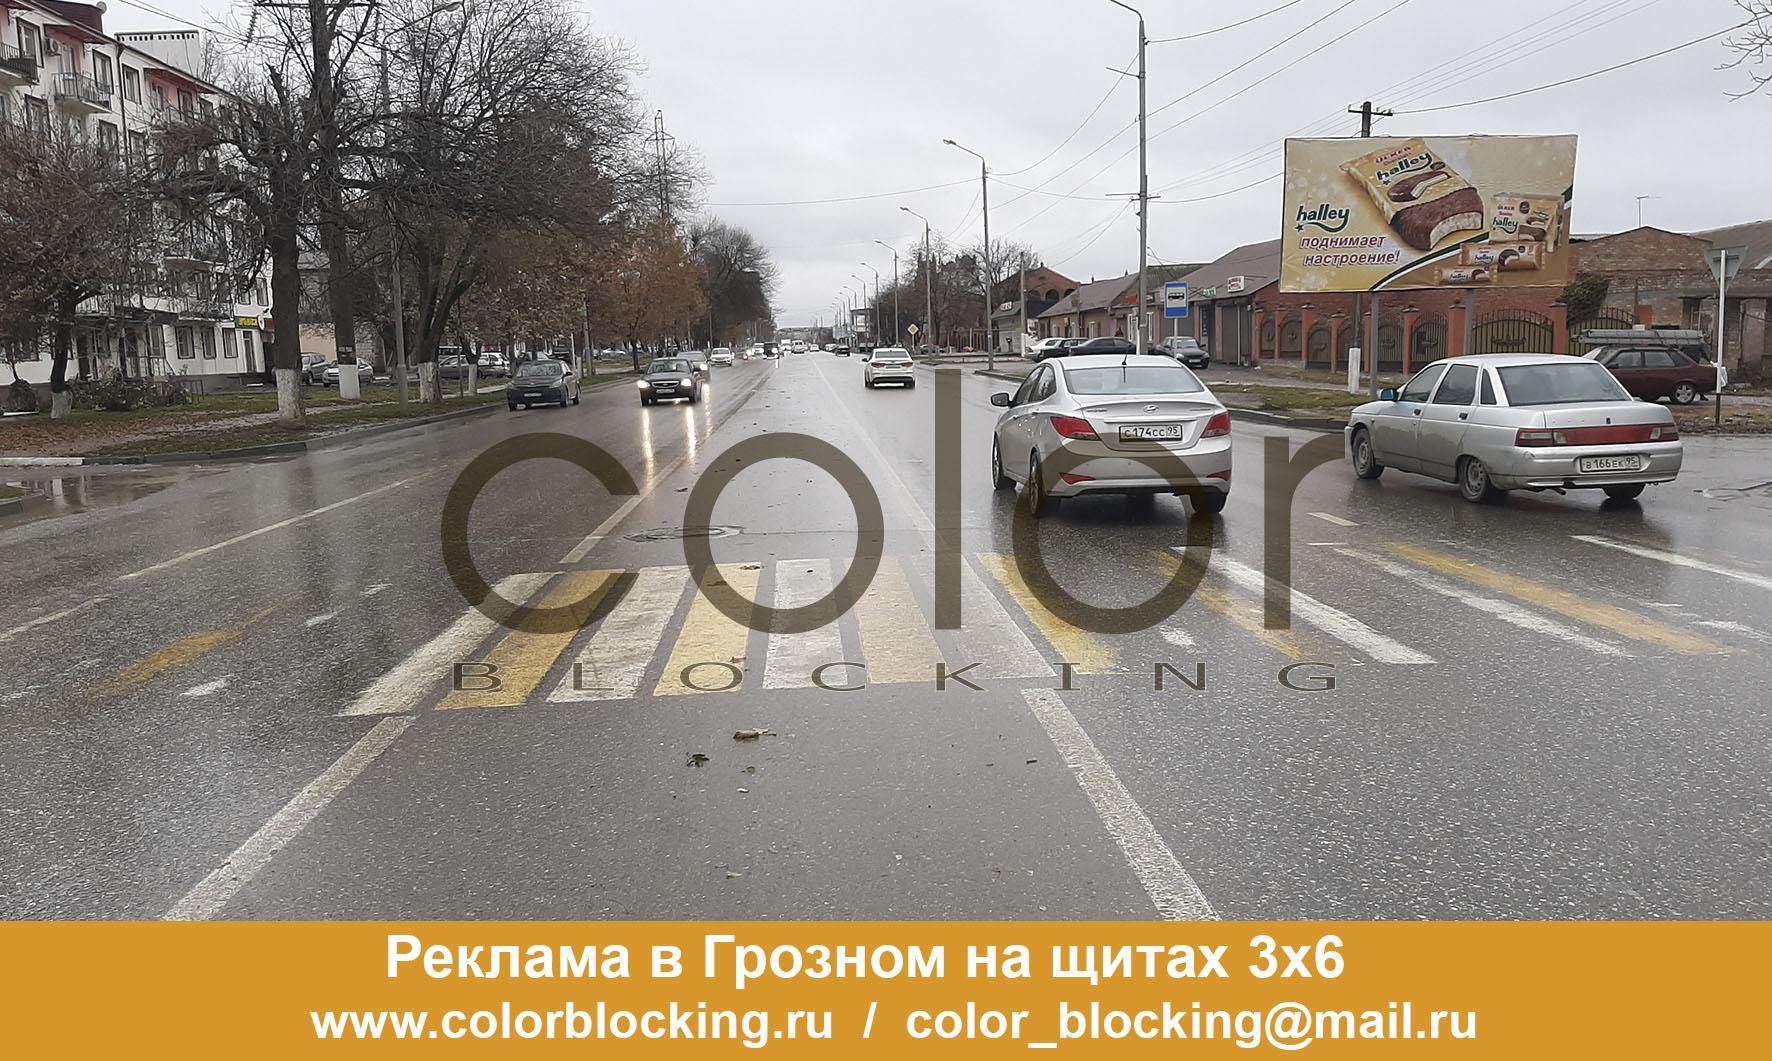 Реклама в Грозном на щитах 3х6 оператор